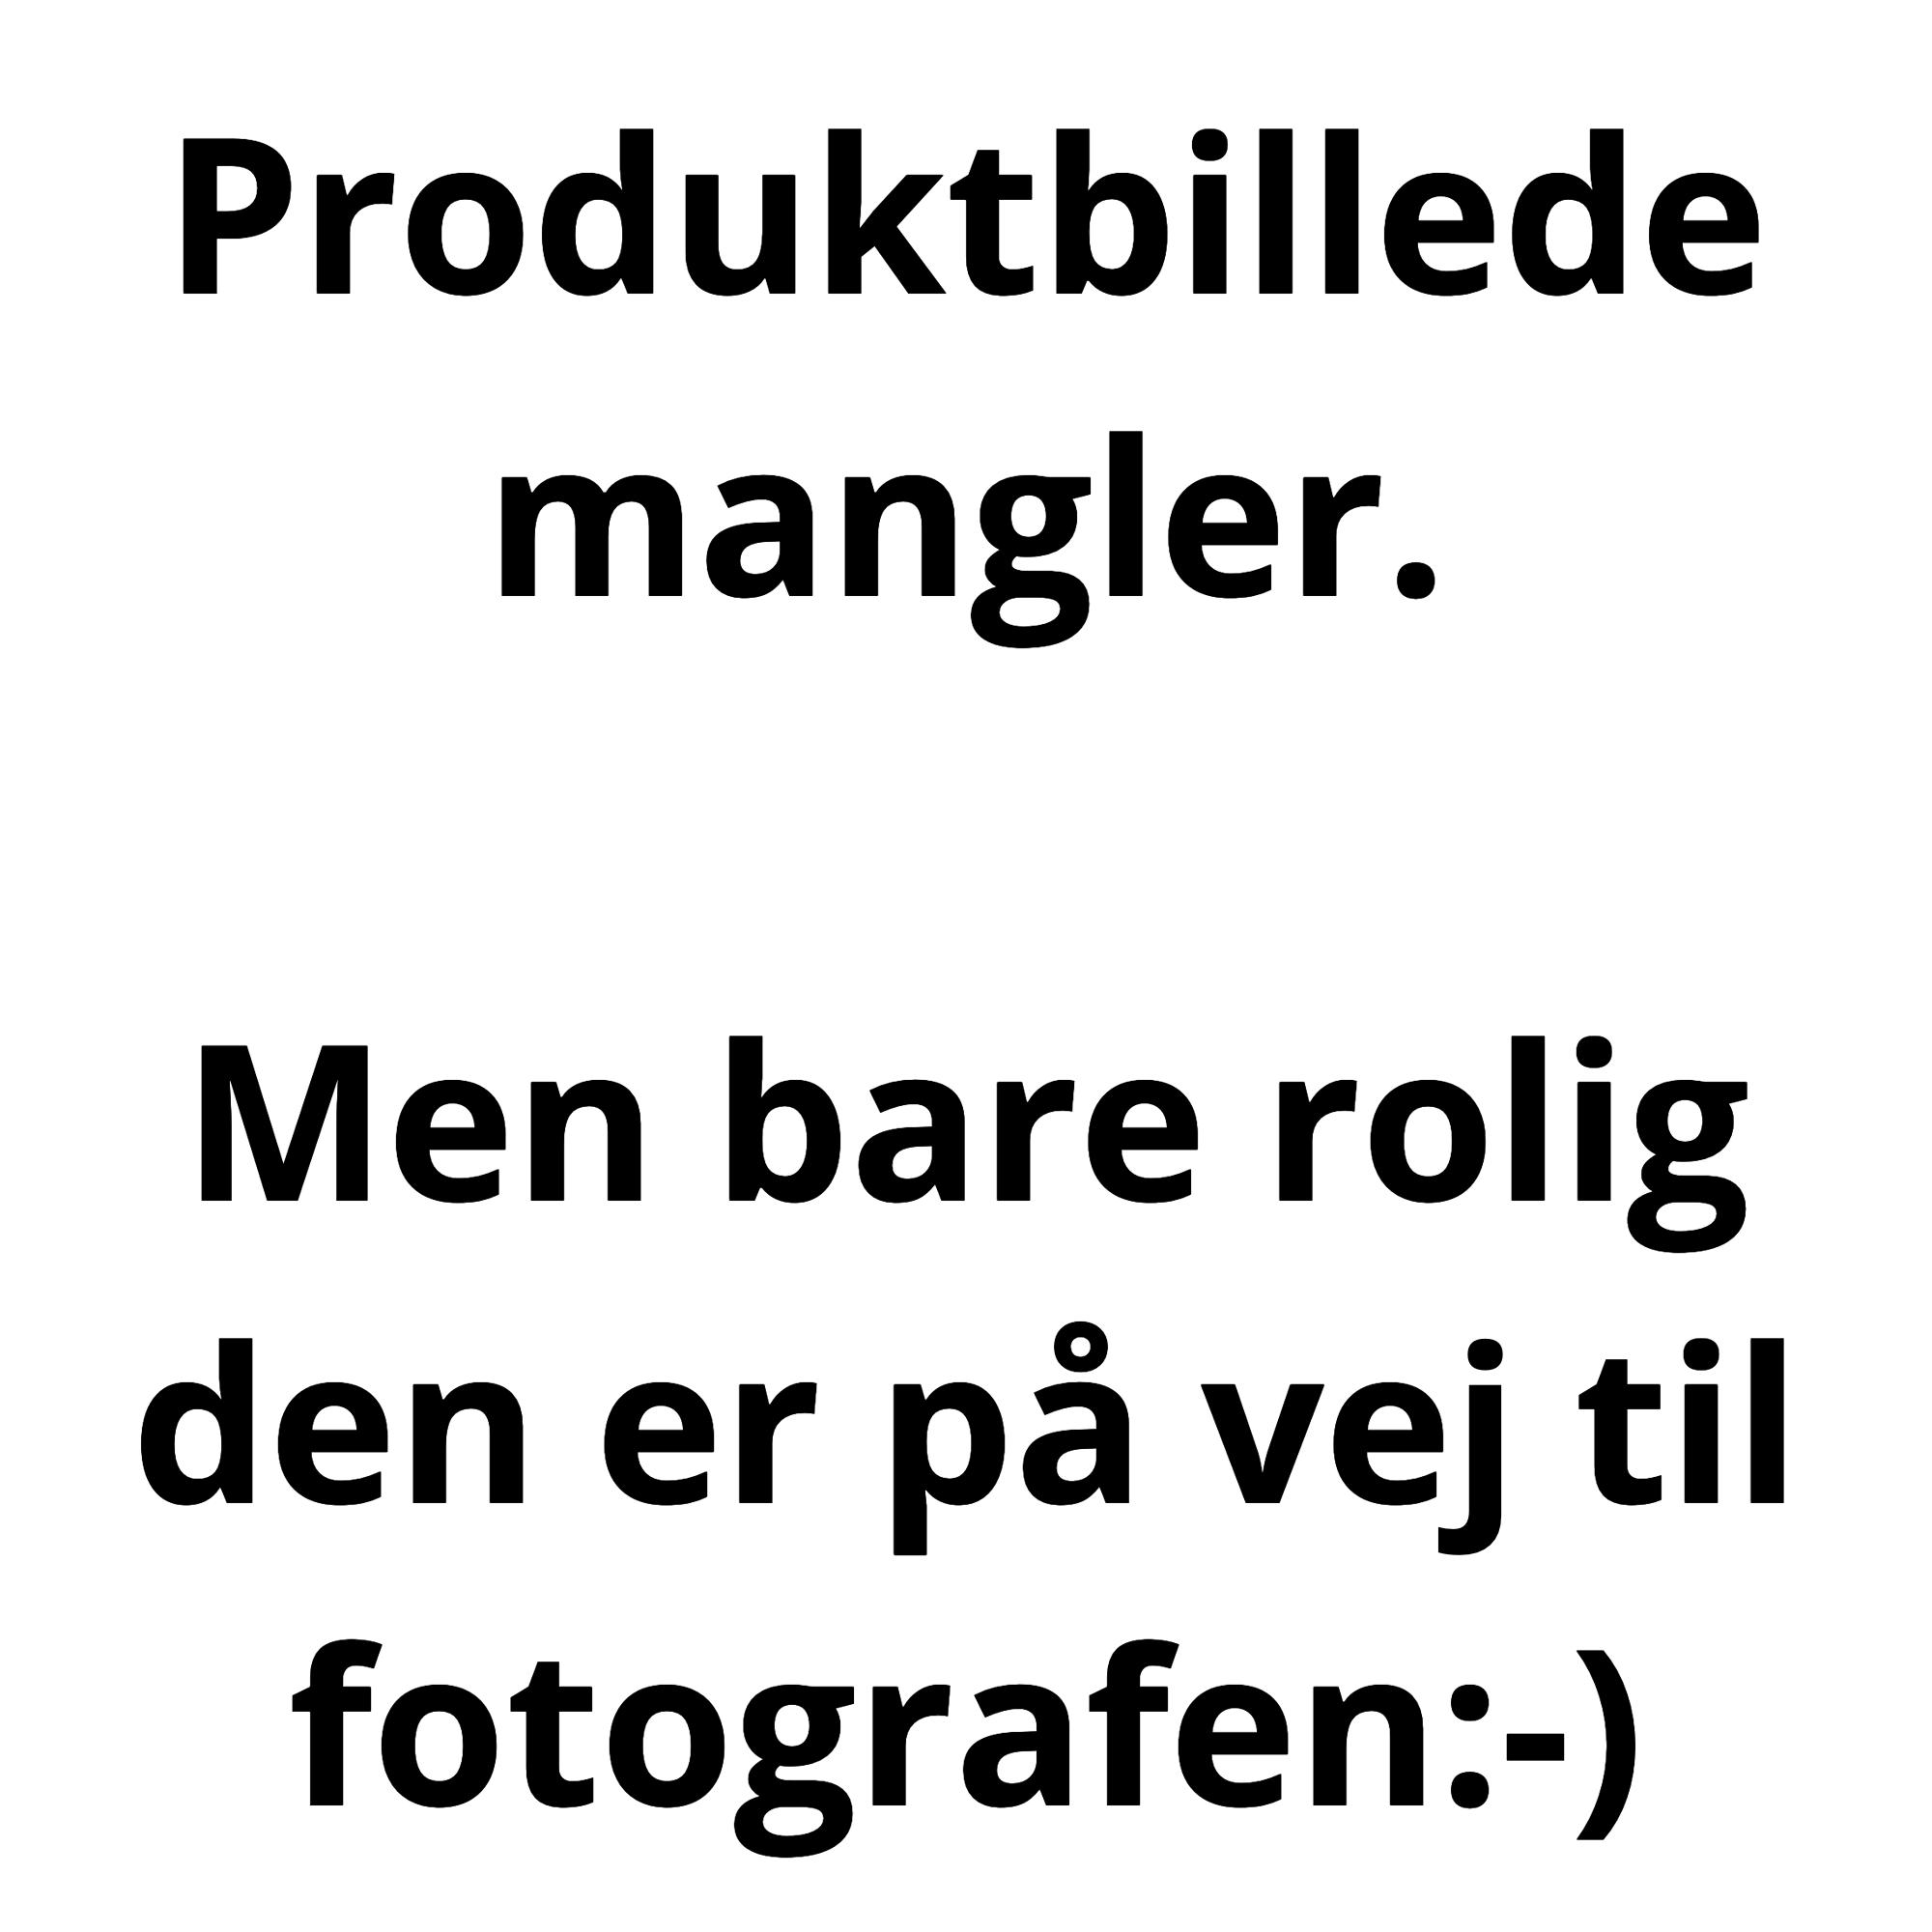 Brodit Apple iPhone 6/6S/7/8/X/Xs med beskyttelsescover B:62-77 D:6-10  - Faststrøms Holder